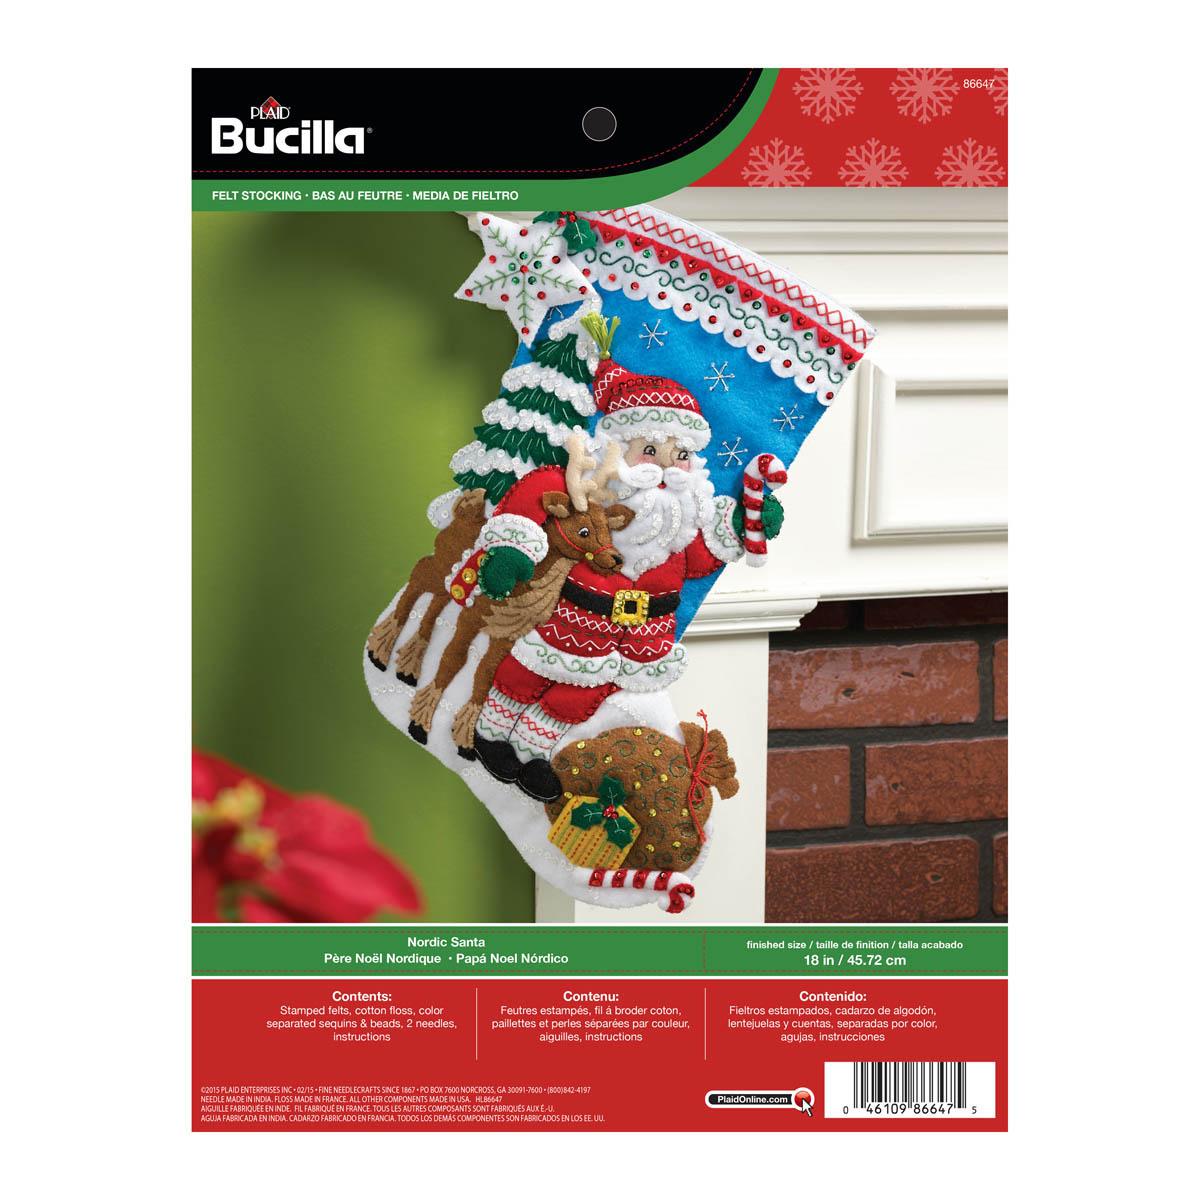 Bucilla ® Seasonal - Felt - Stocking Kits - Nordic Santa - 86647